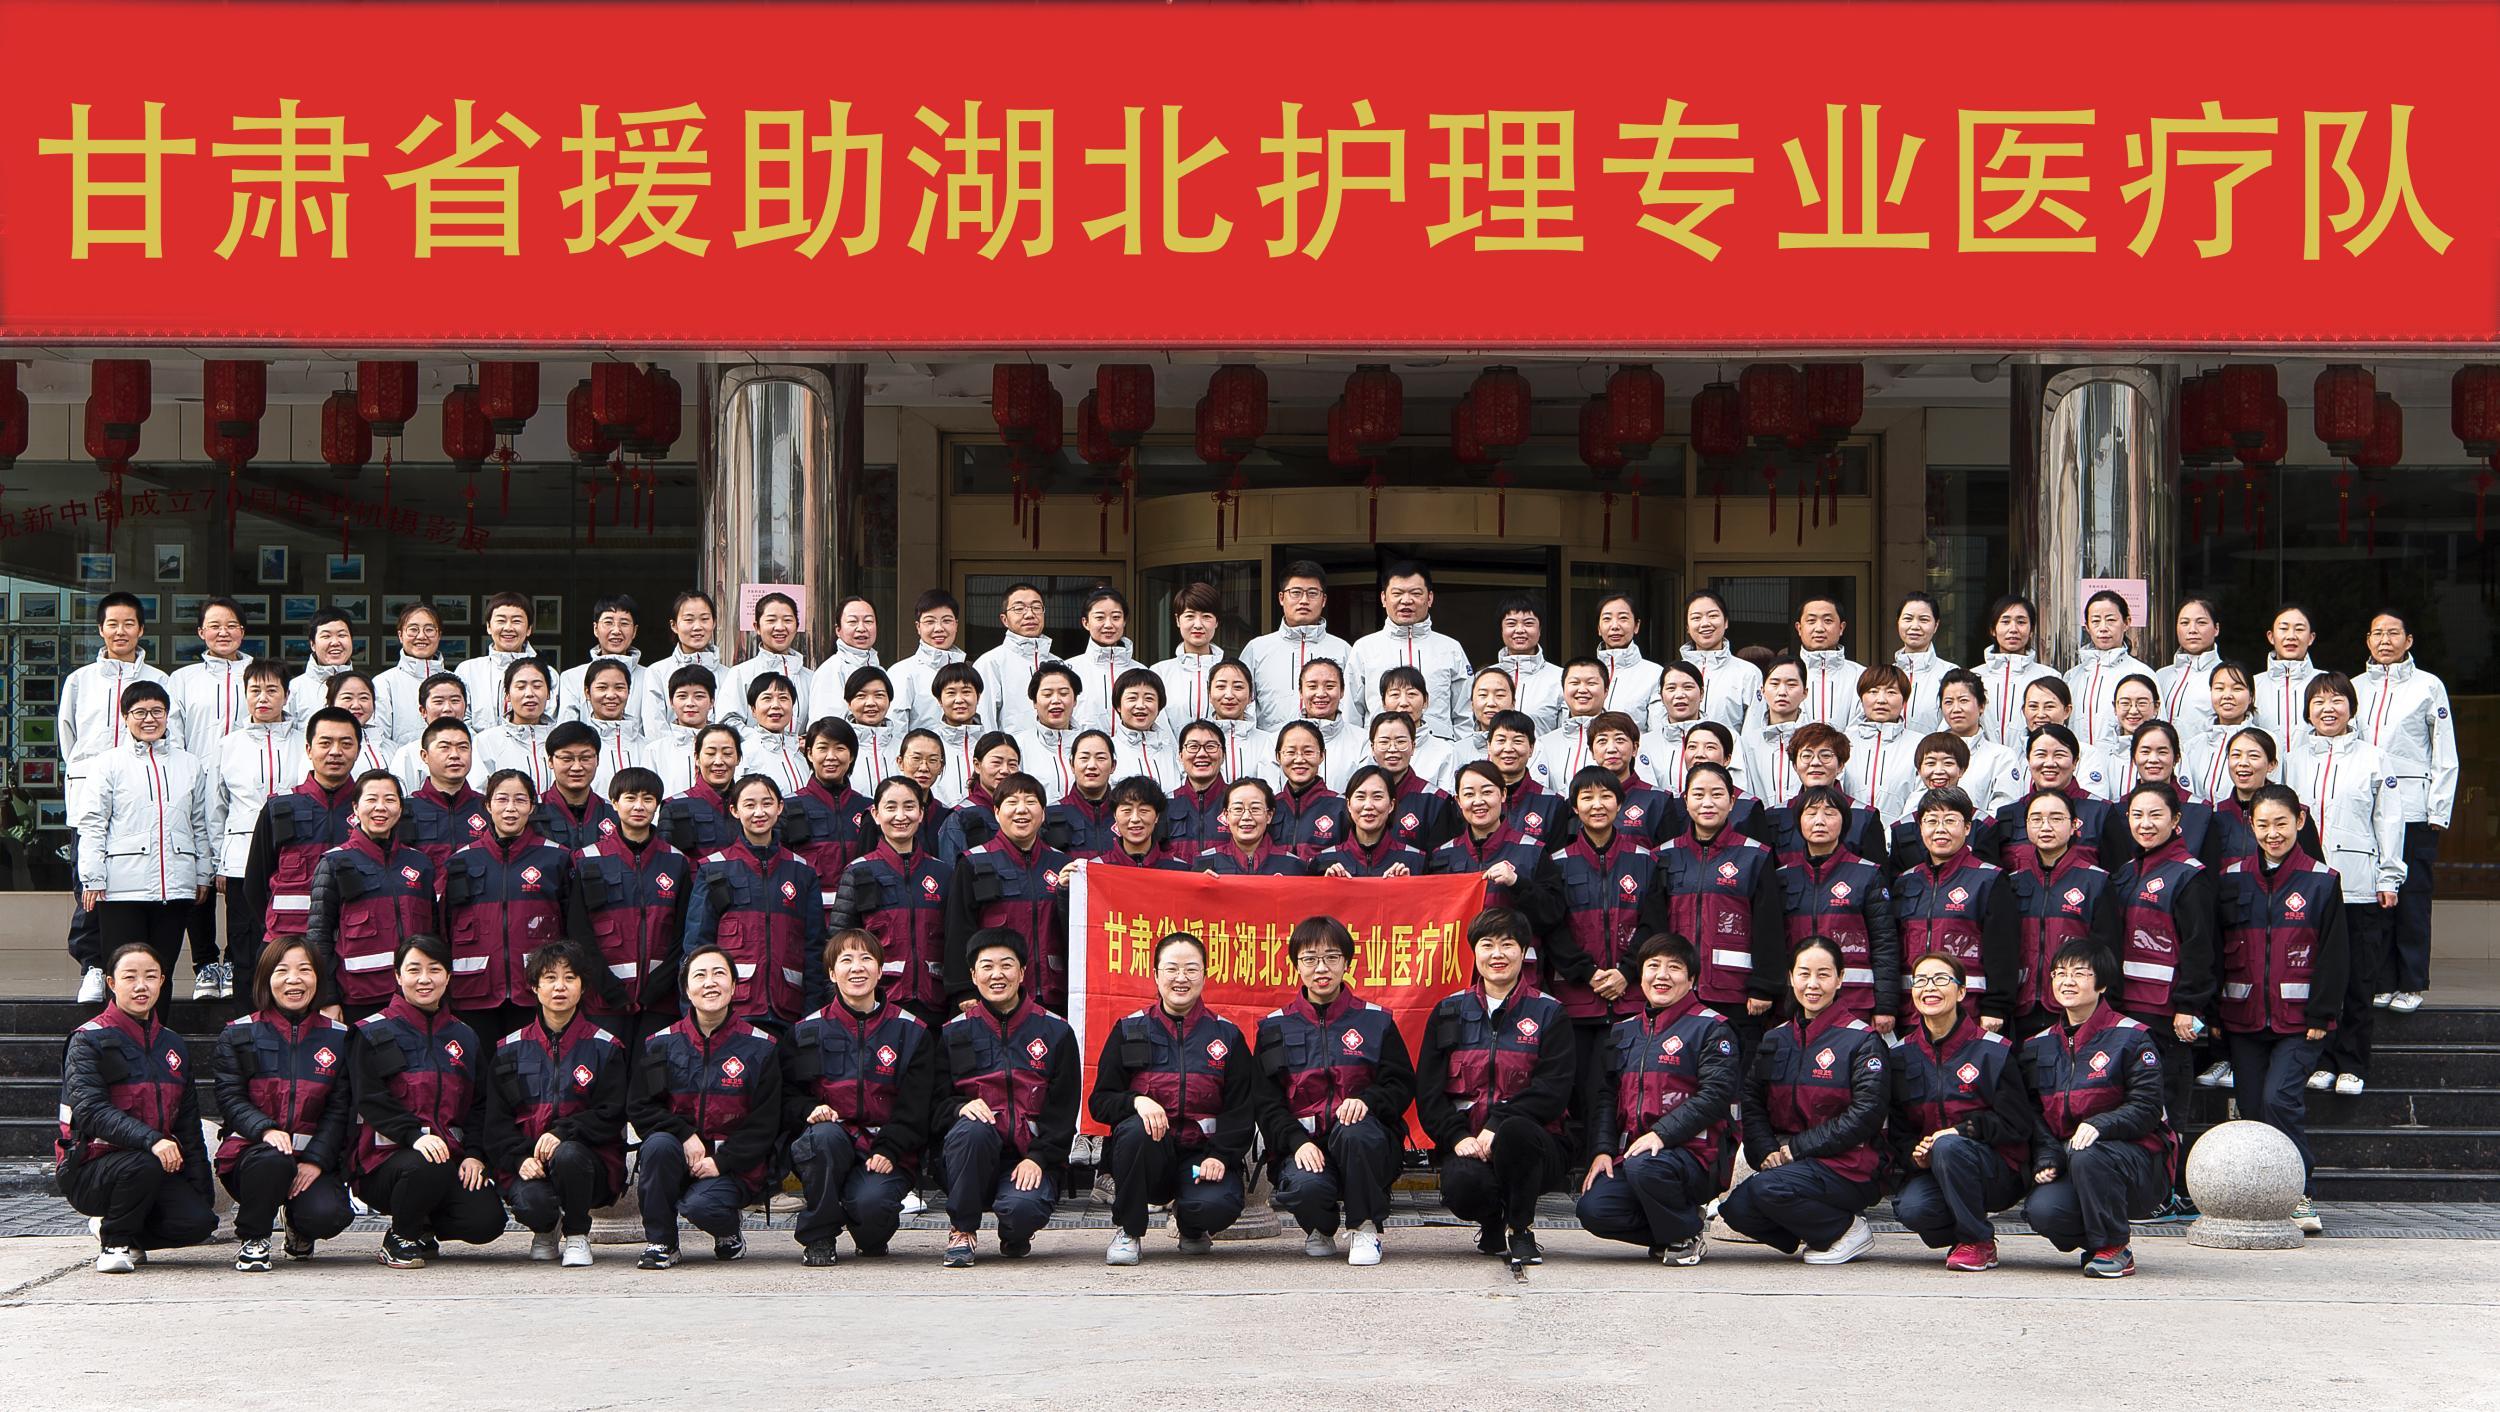 http://www.edaojz.cn/qichexingye/551616.html